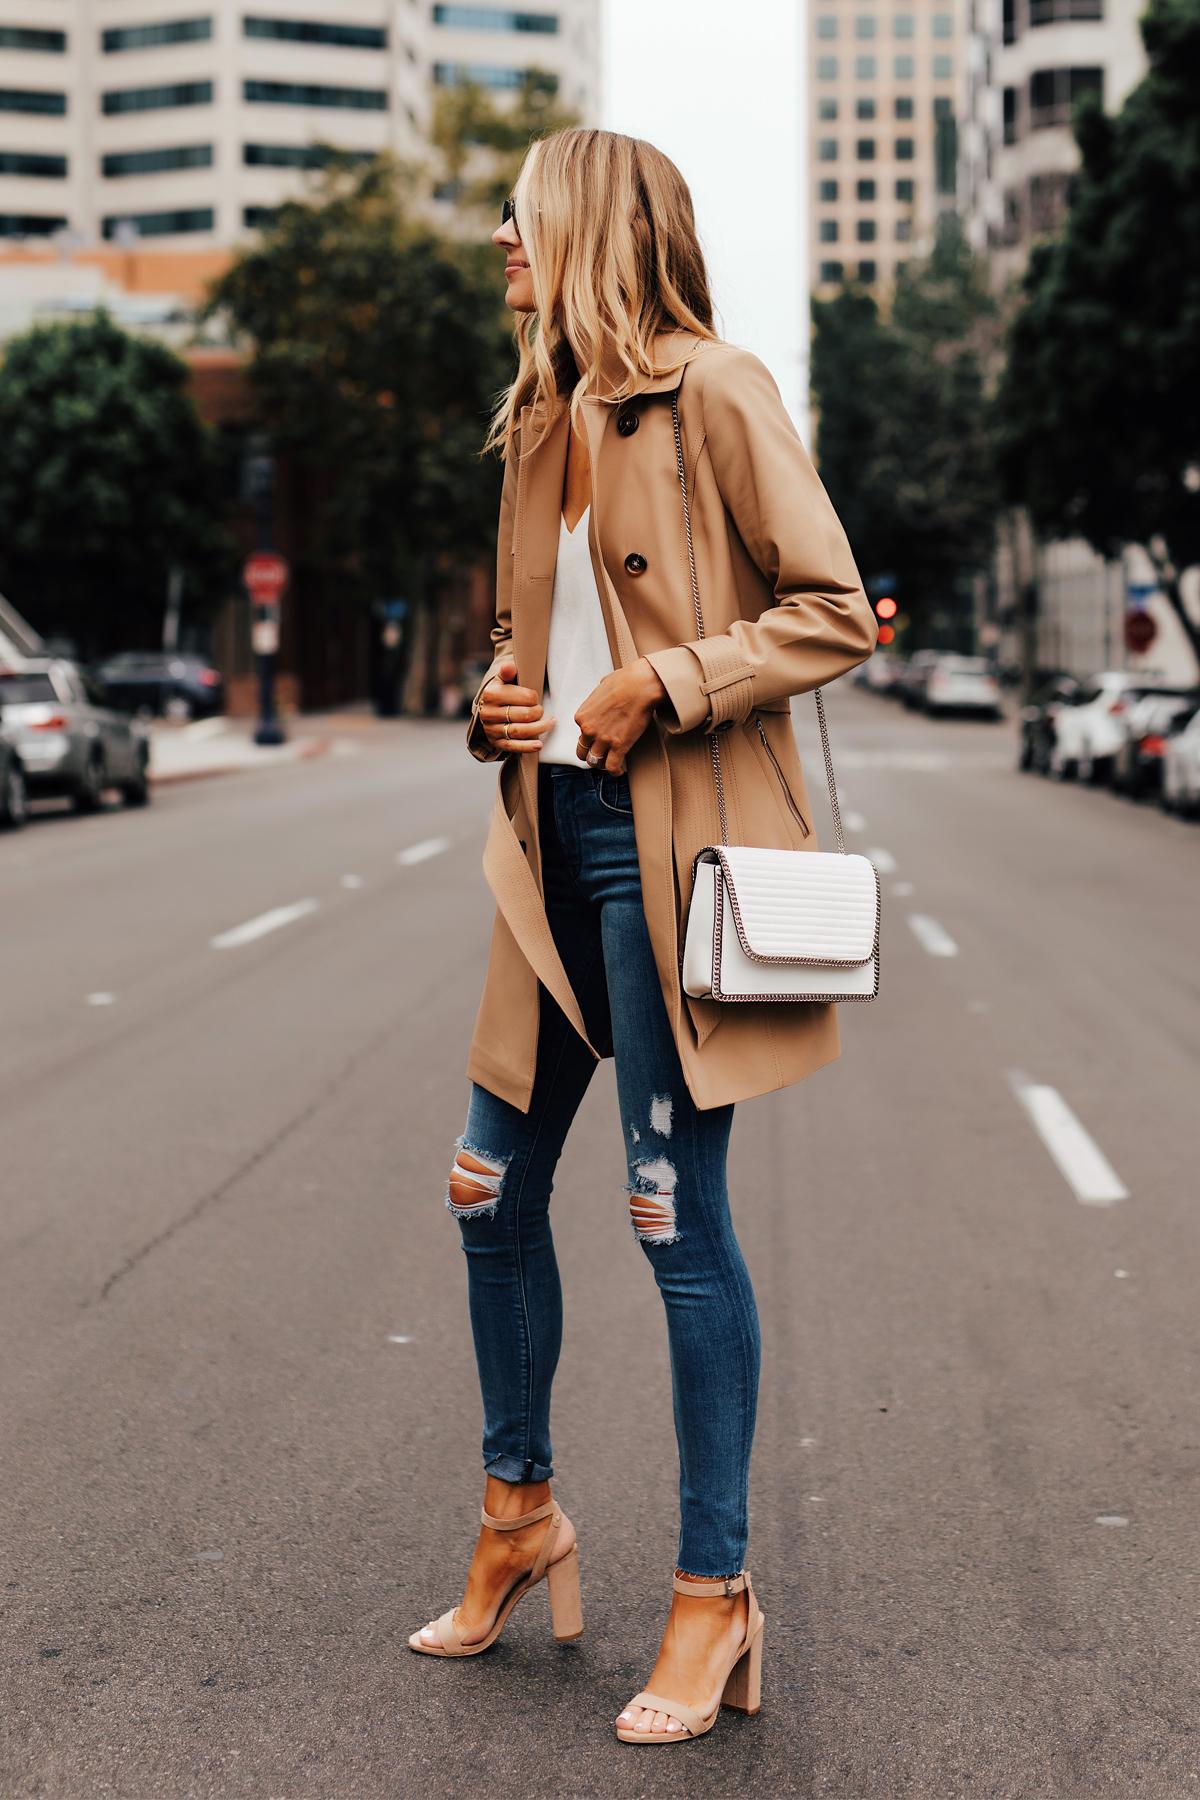 Fashion Jackson Wearing Express Tan Trench Coat White Tank Express Ripped Skinny Jeans White Handbag Tan Ankle Strap Heeled Sandals